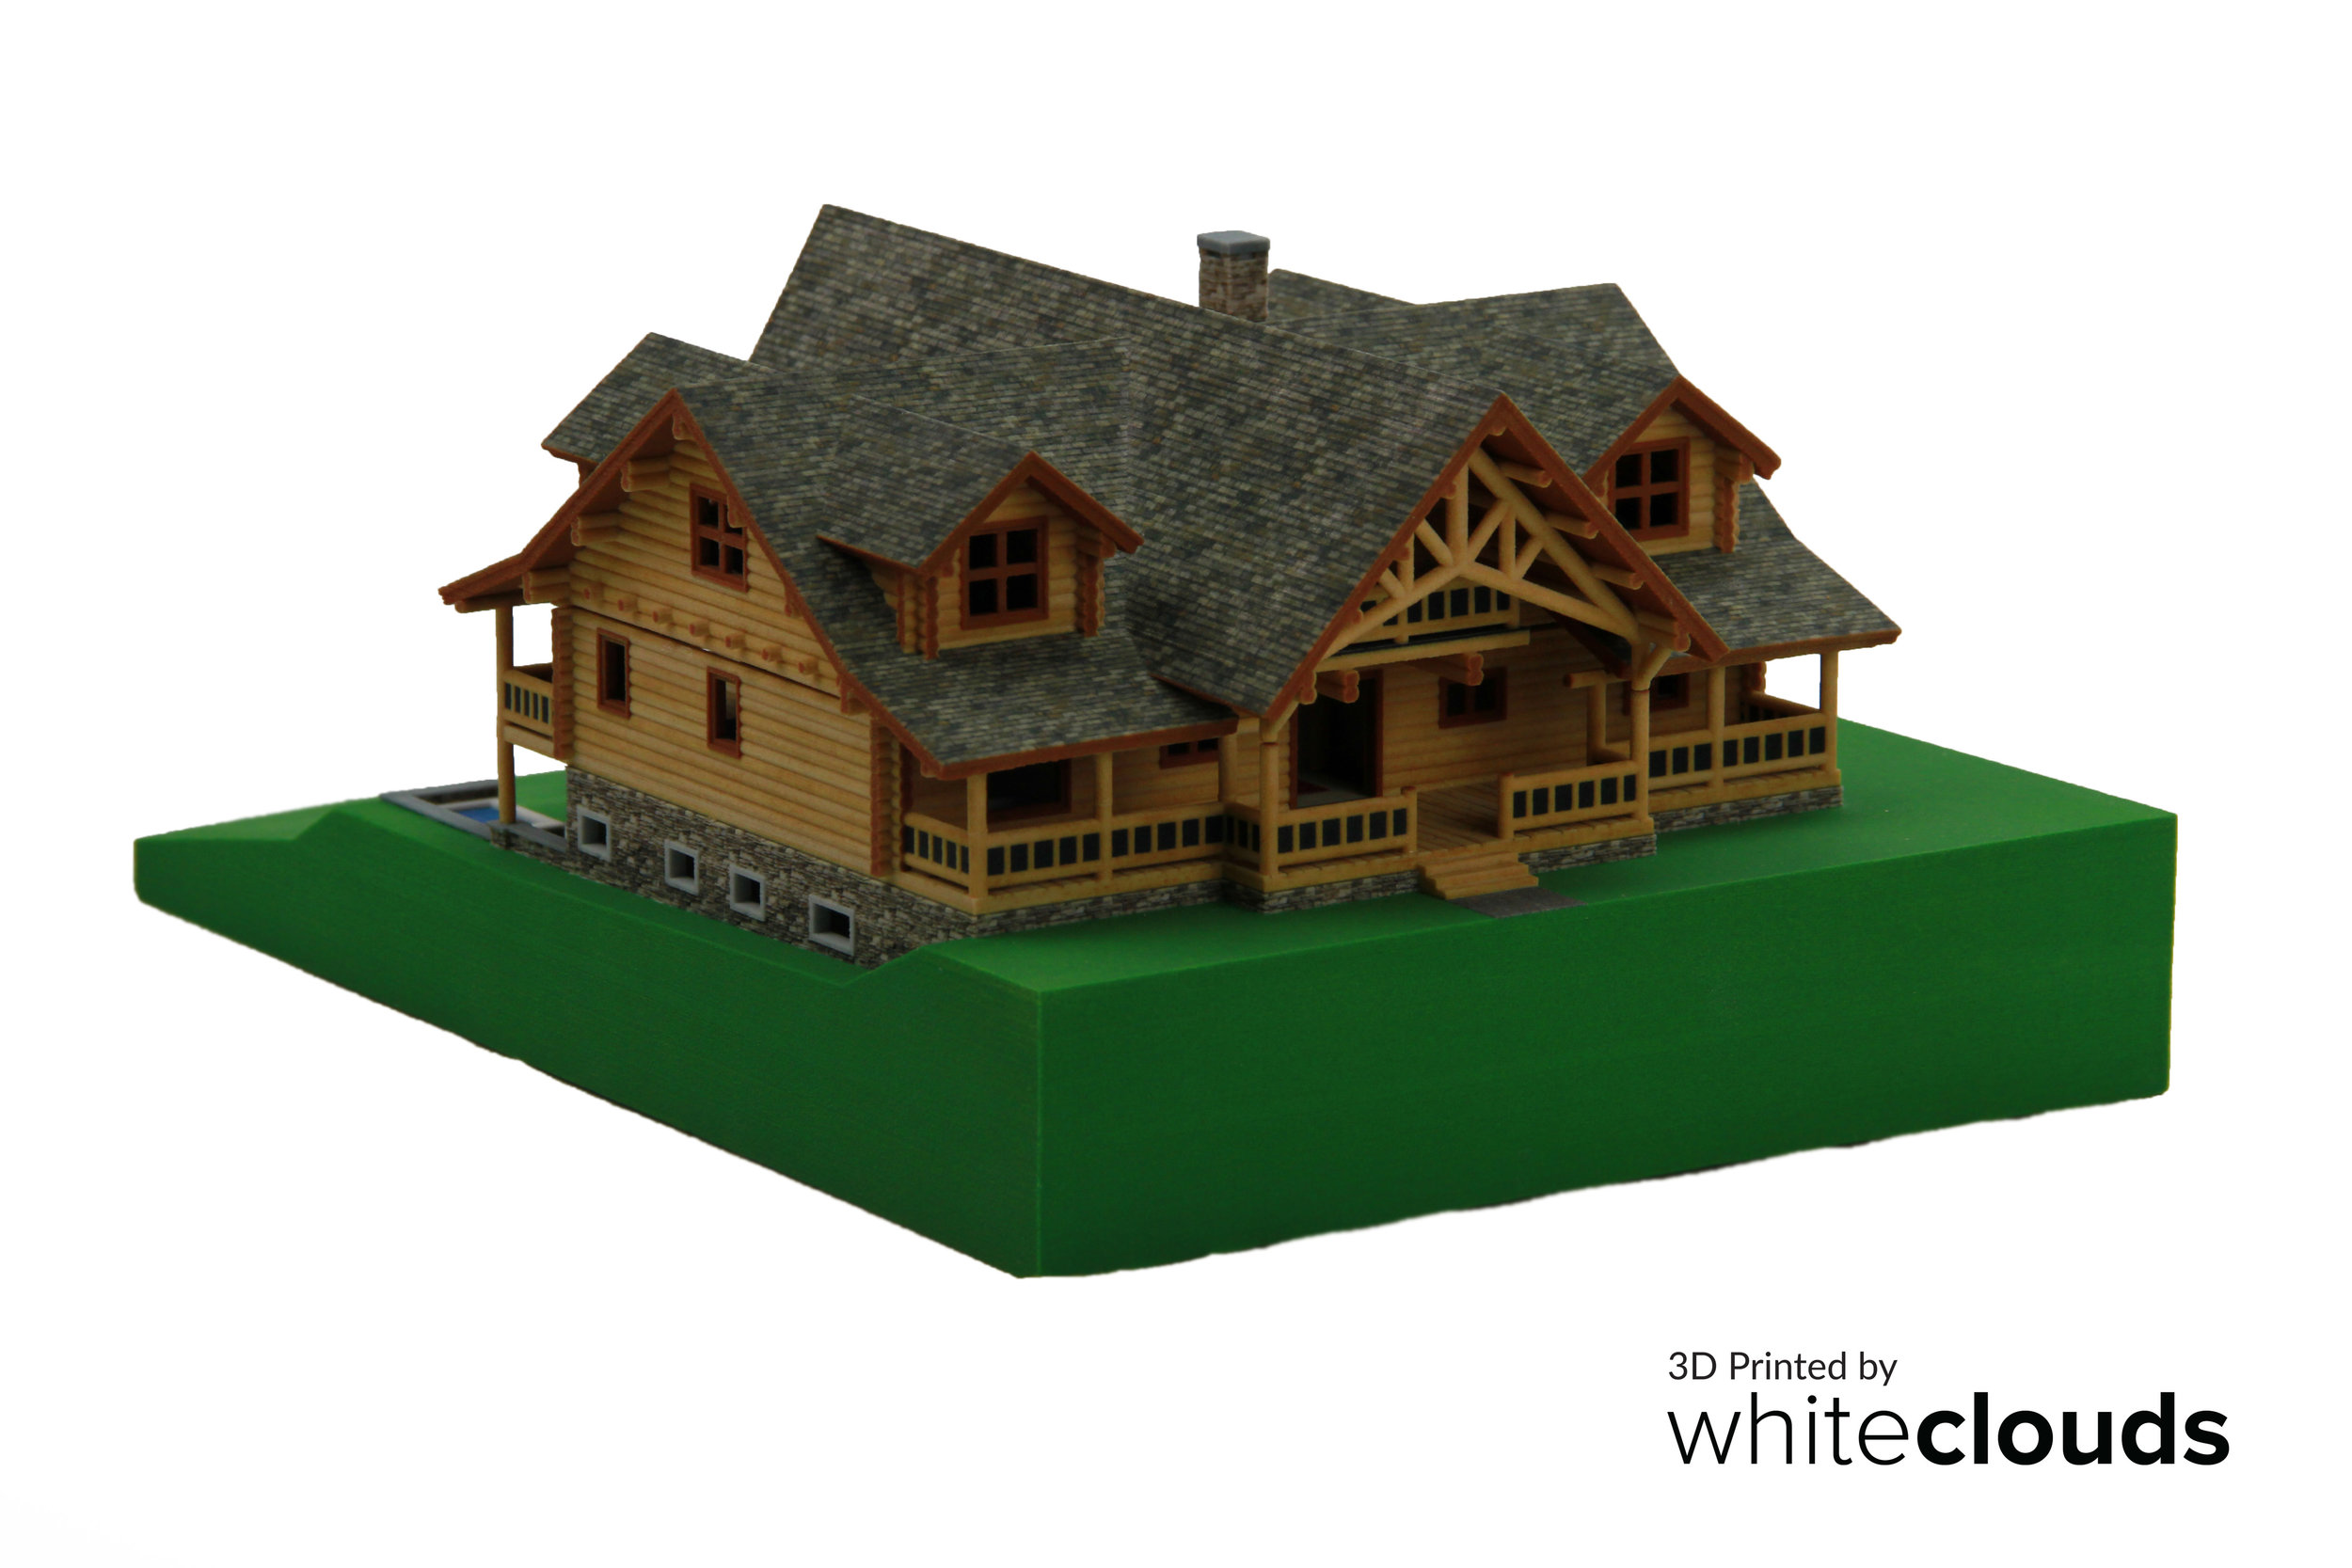 3D-Printed-WhiteClouds-Cabin-Architectural-Bim6X-1.jpg